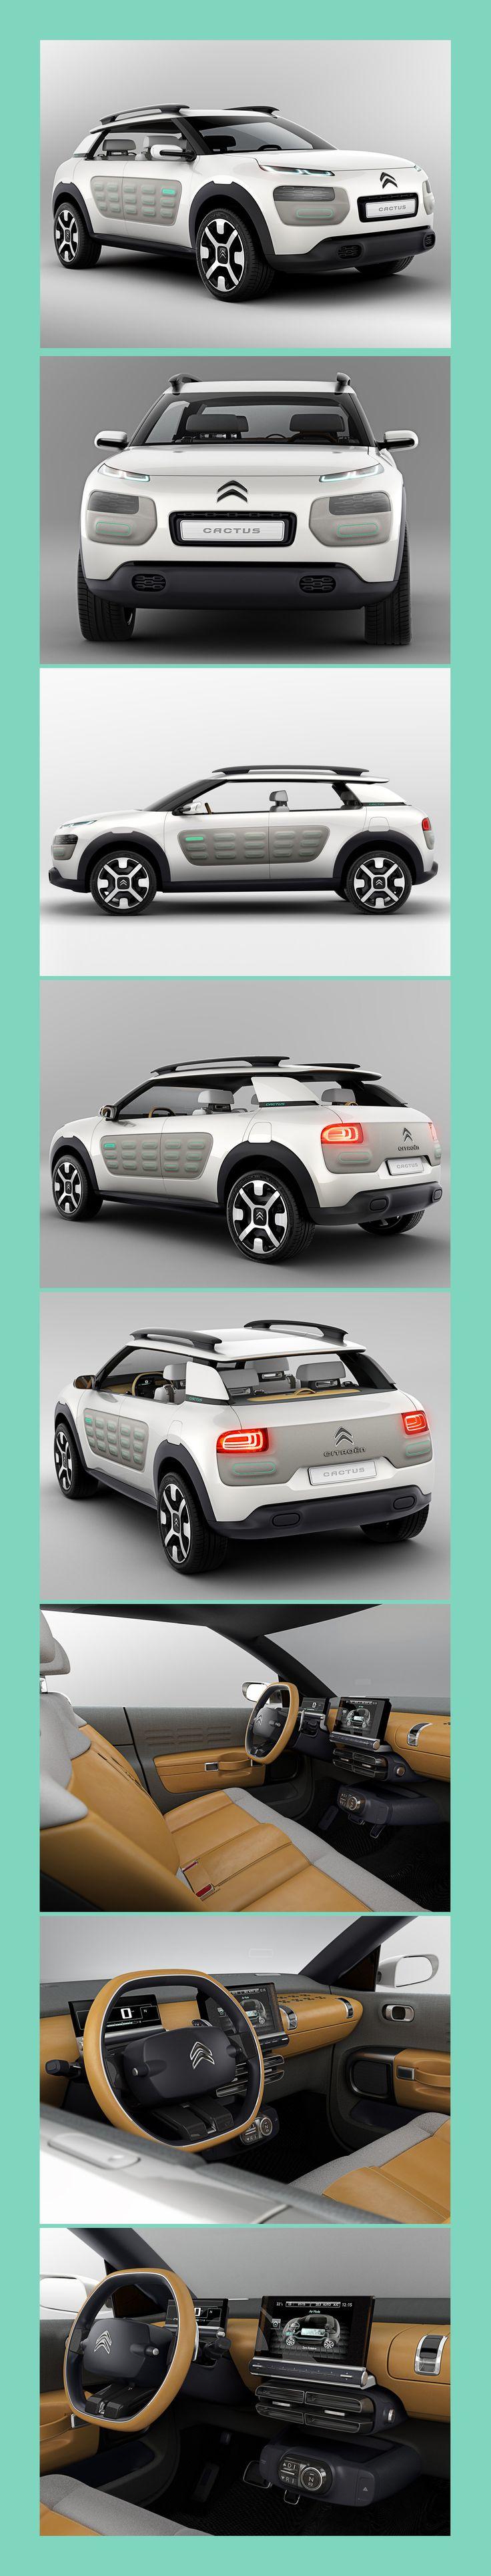 Citroën Cactus Concept Car - Frankfurt 2013